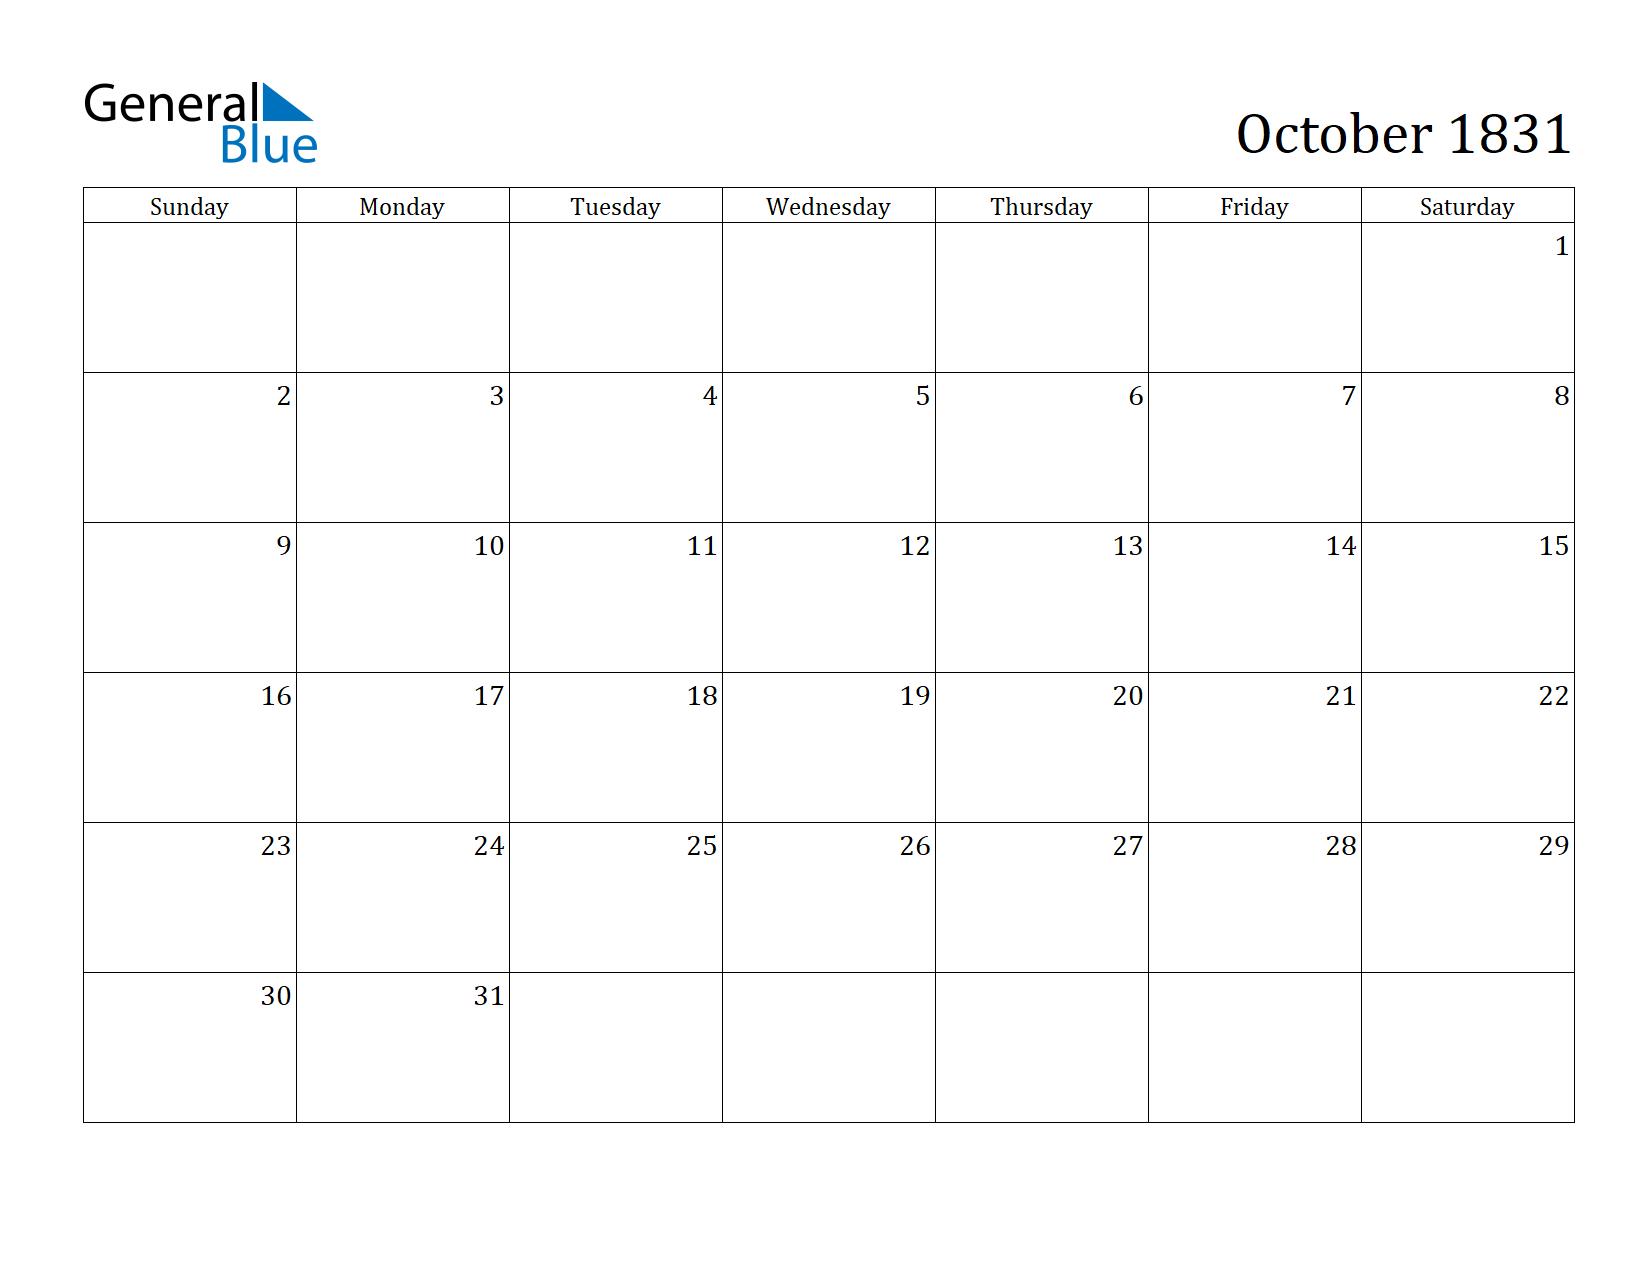 Image of October 1831 Calendar